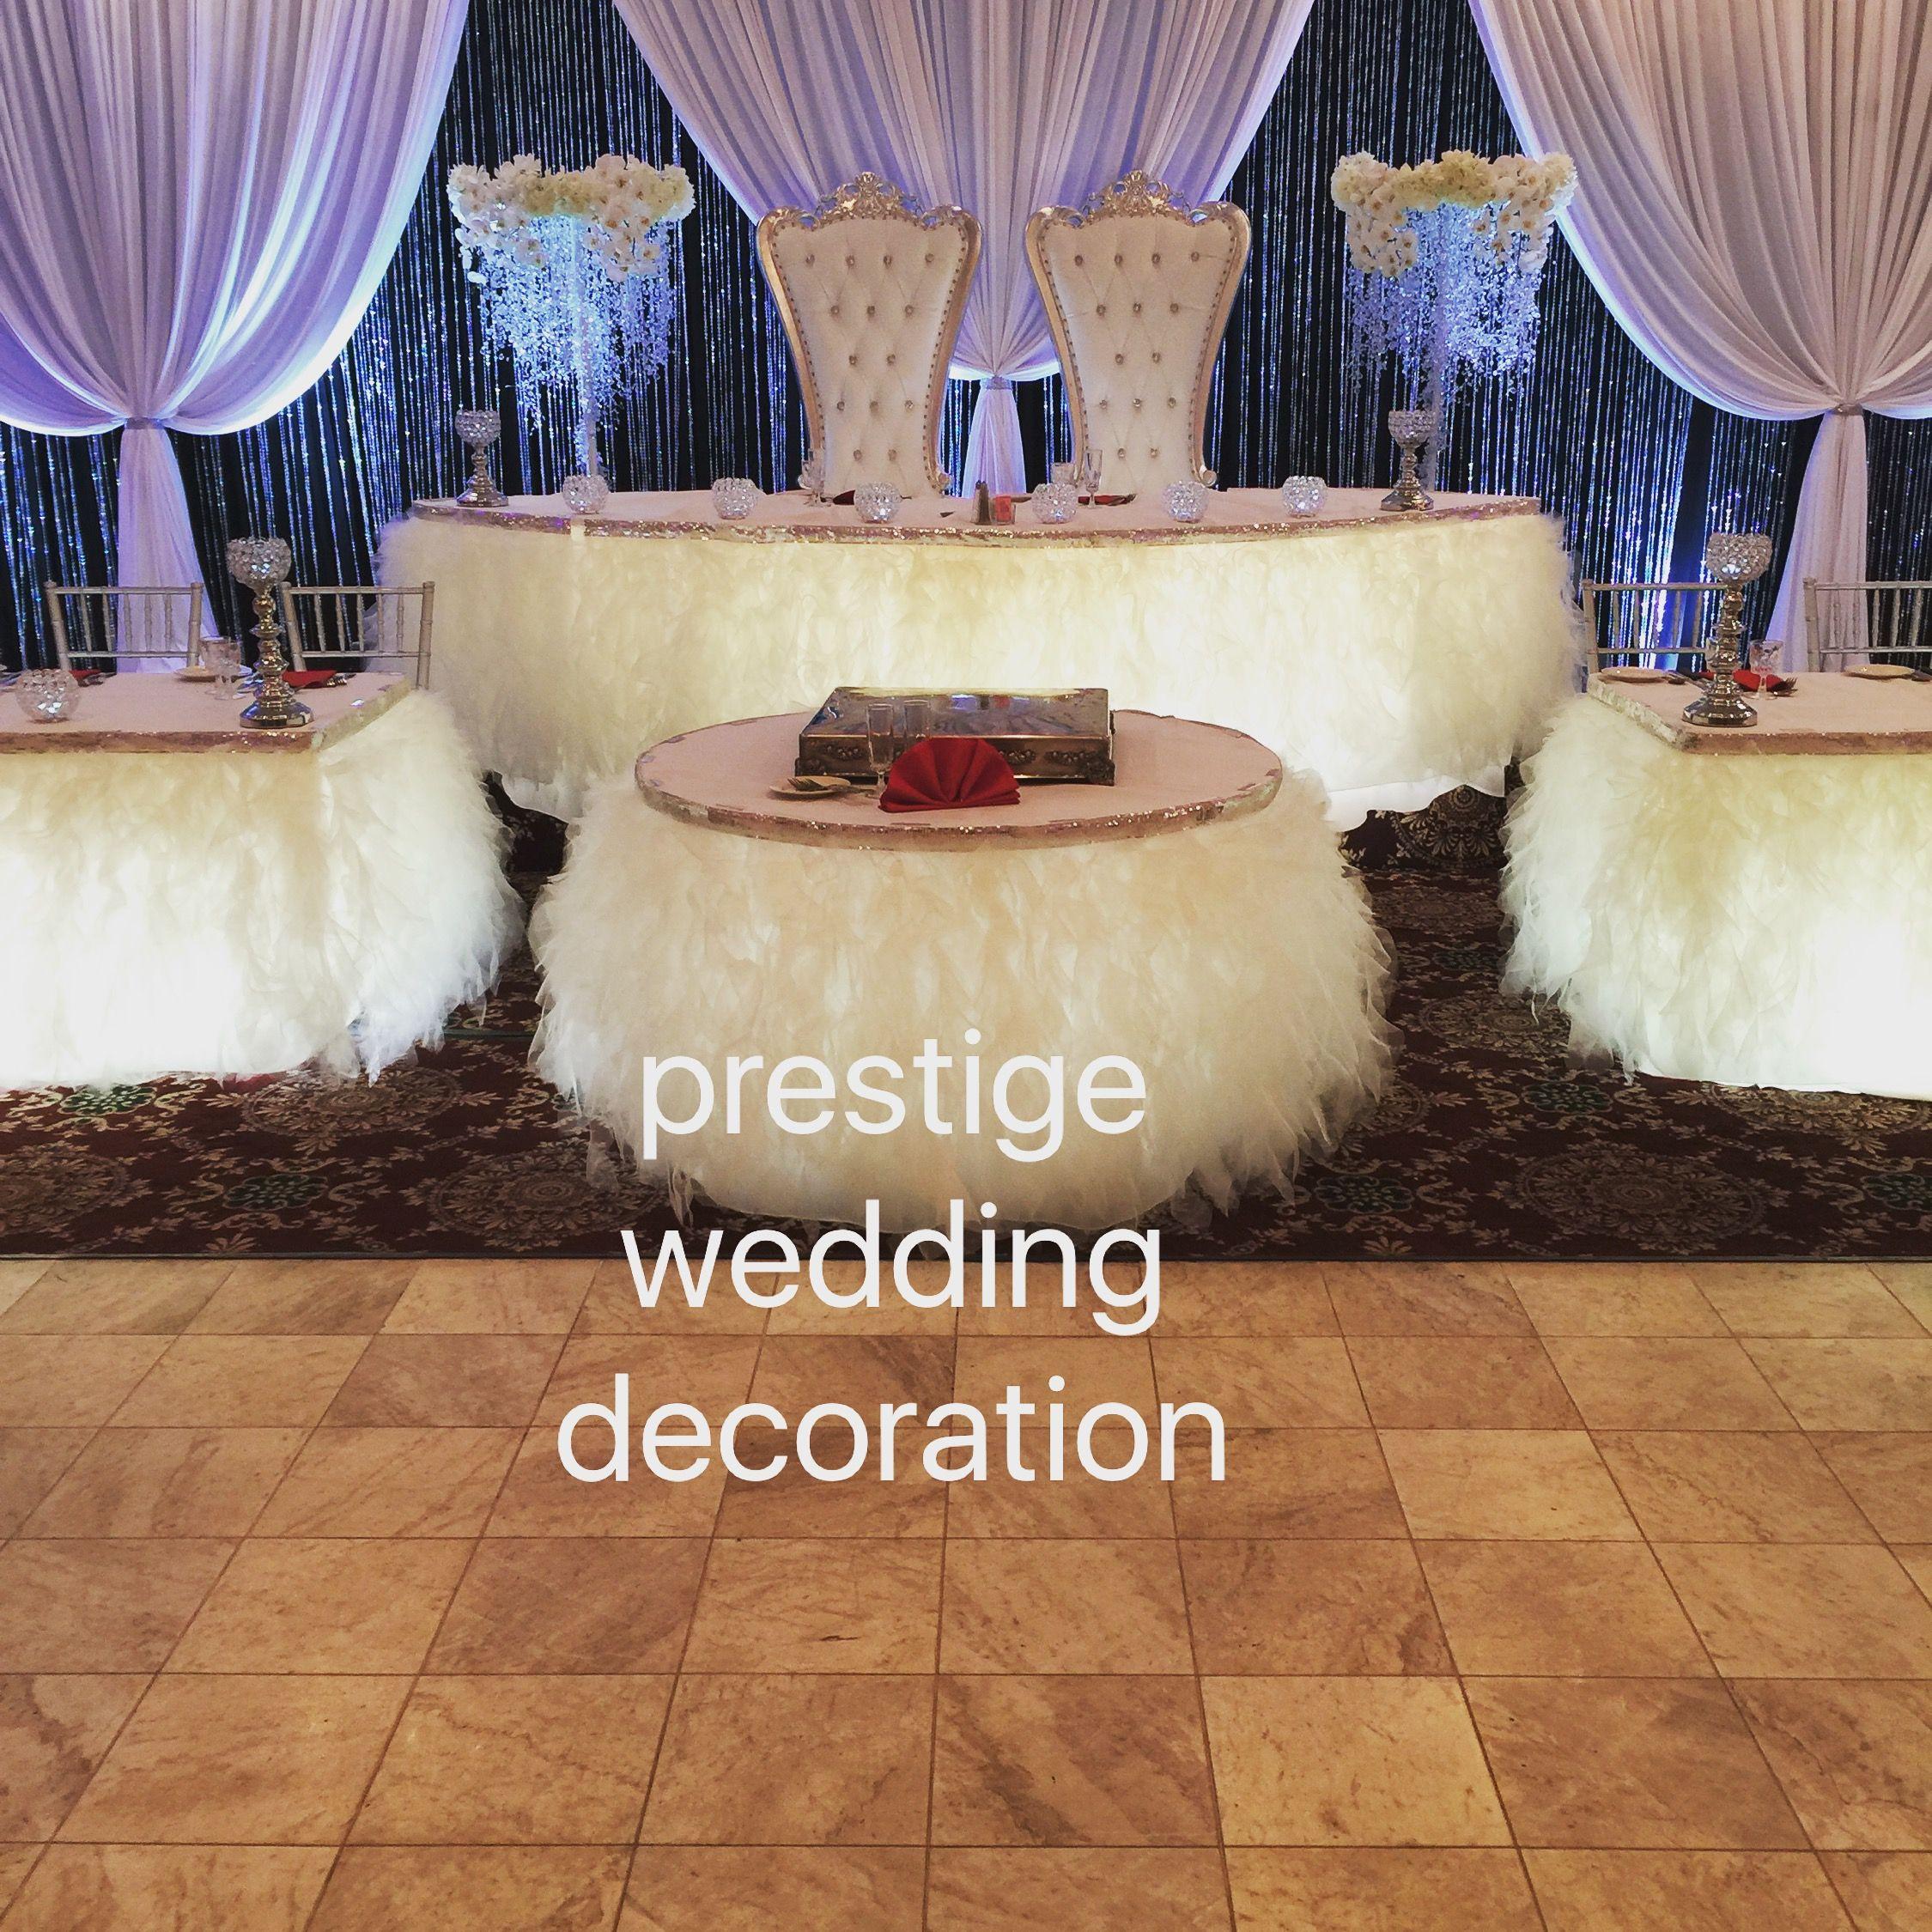 Wedding Reception Decor Ideas Bride And Groom Throne Chairs White